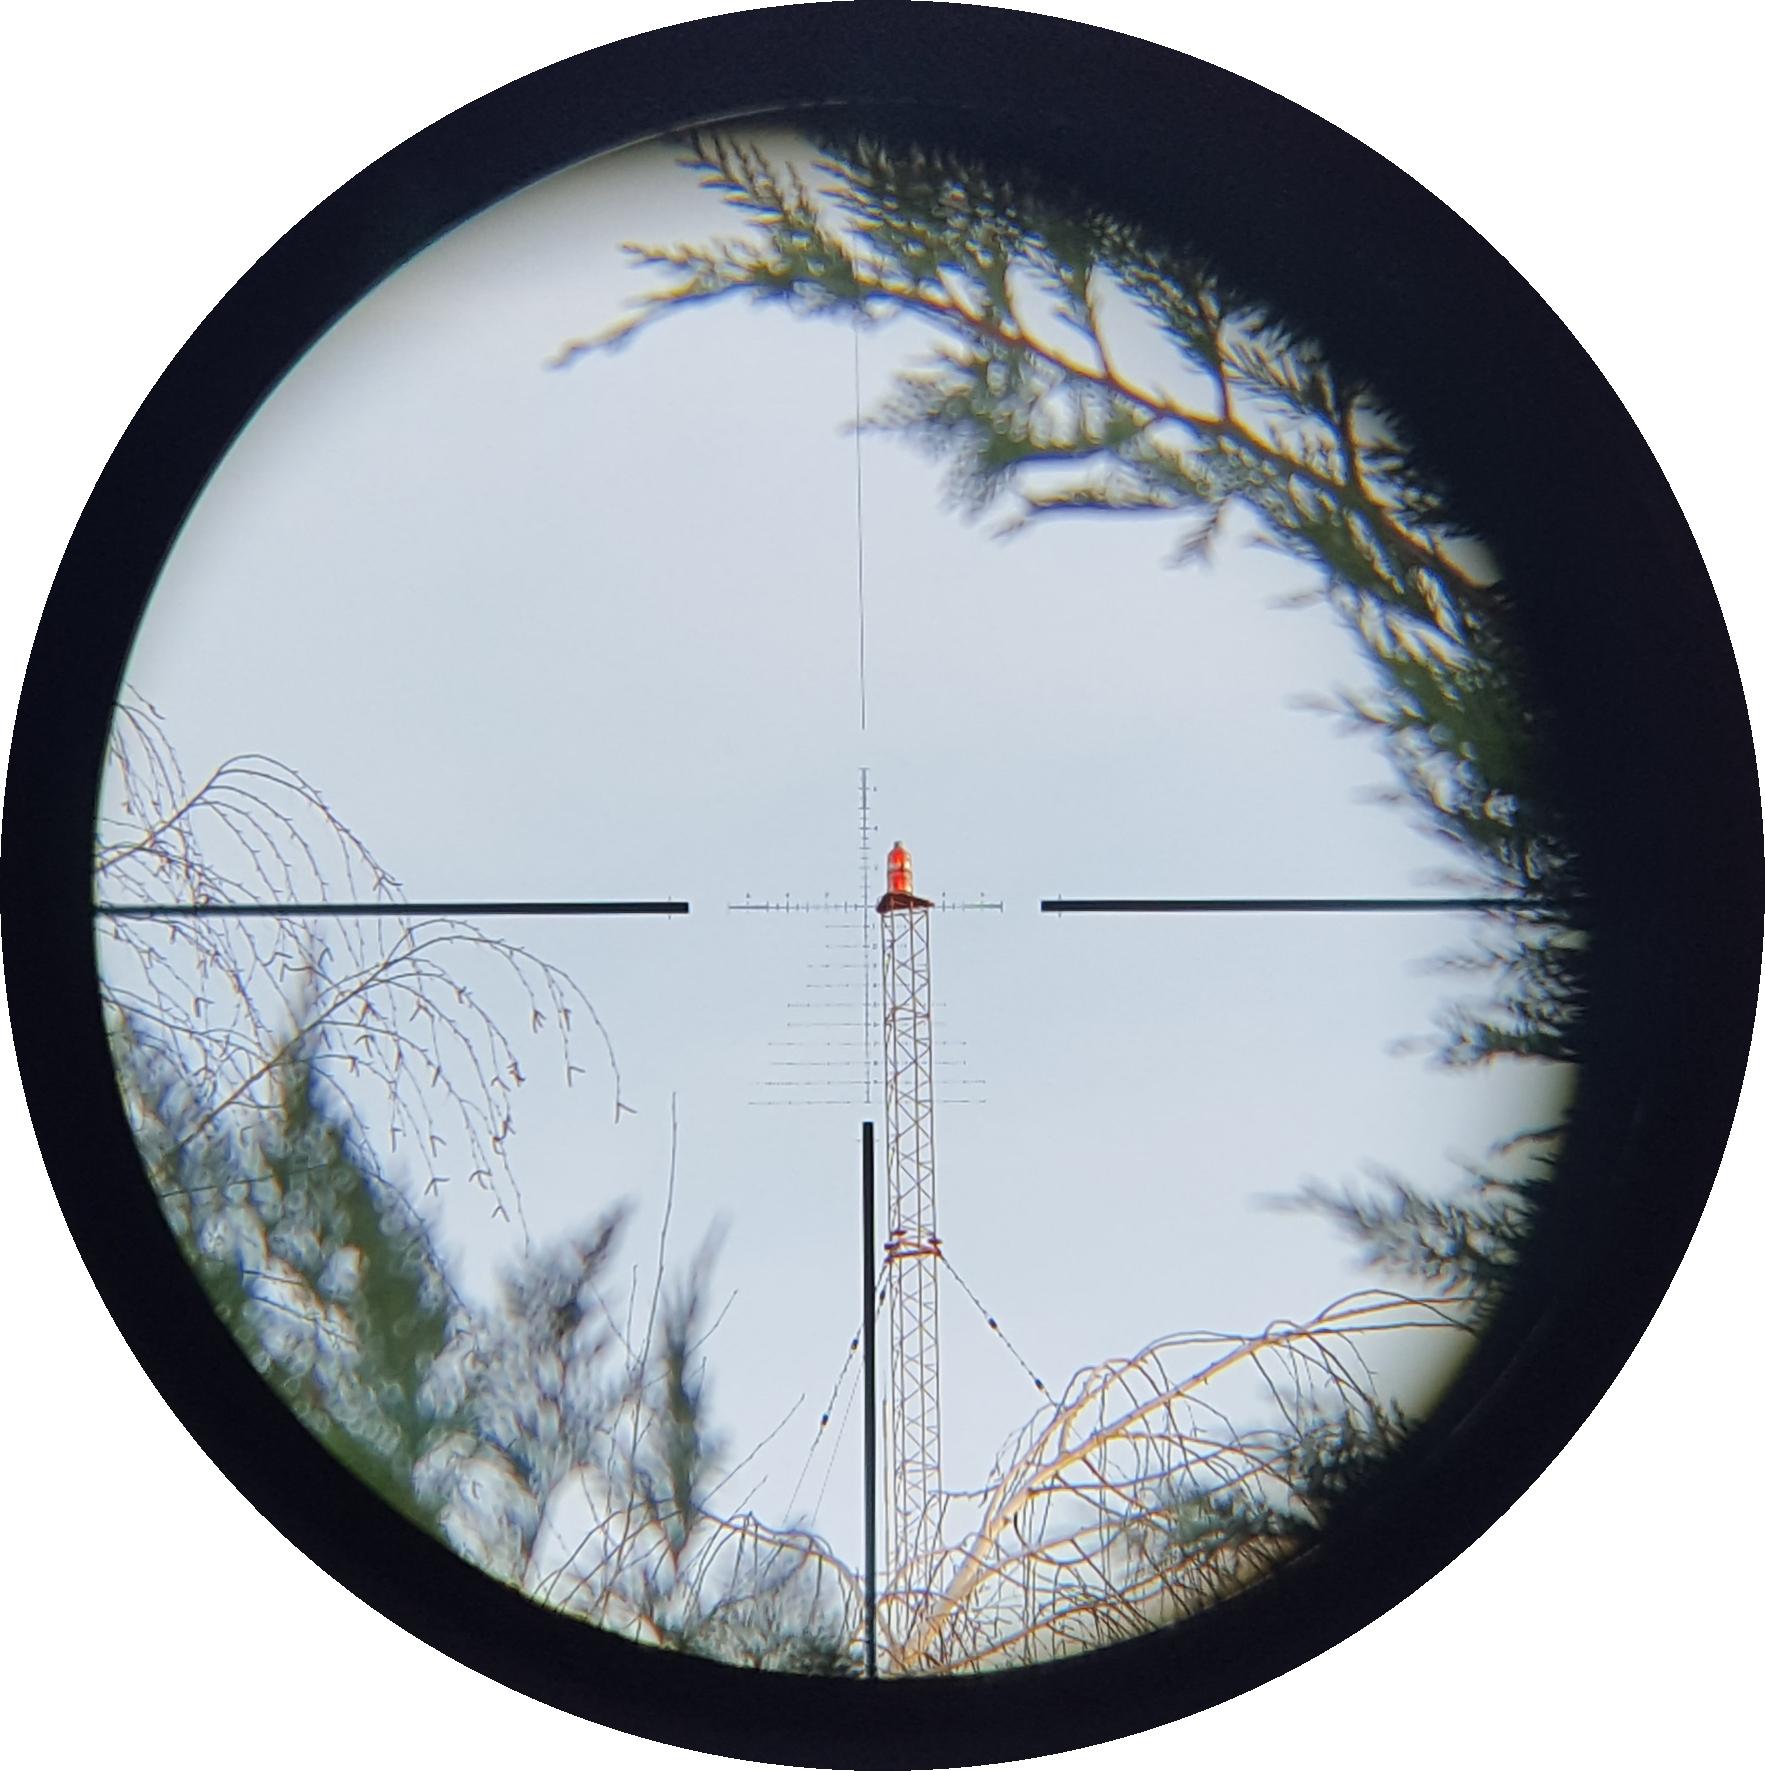 250 yards, sunny day, 5x